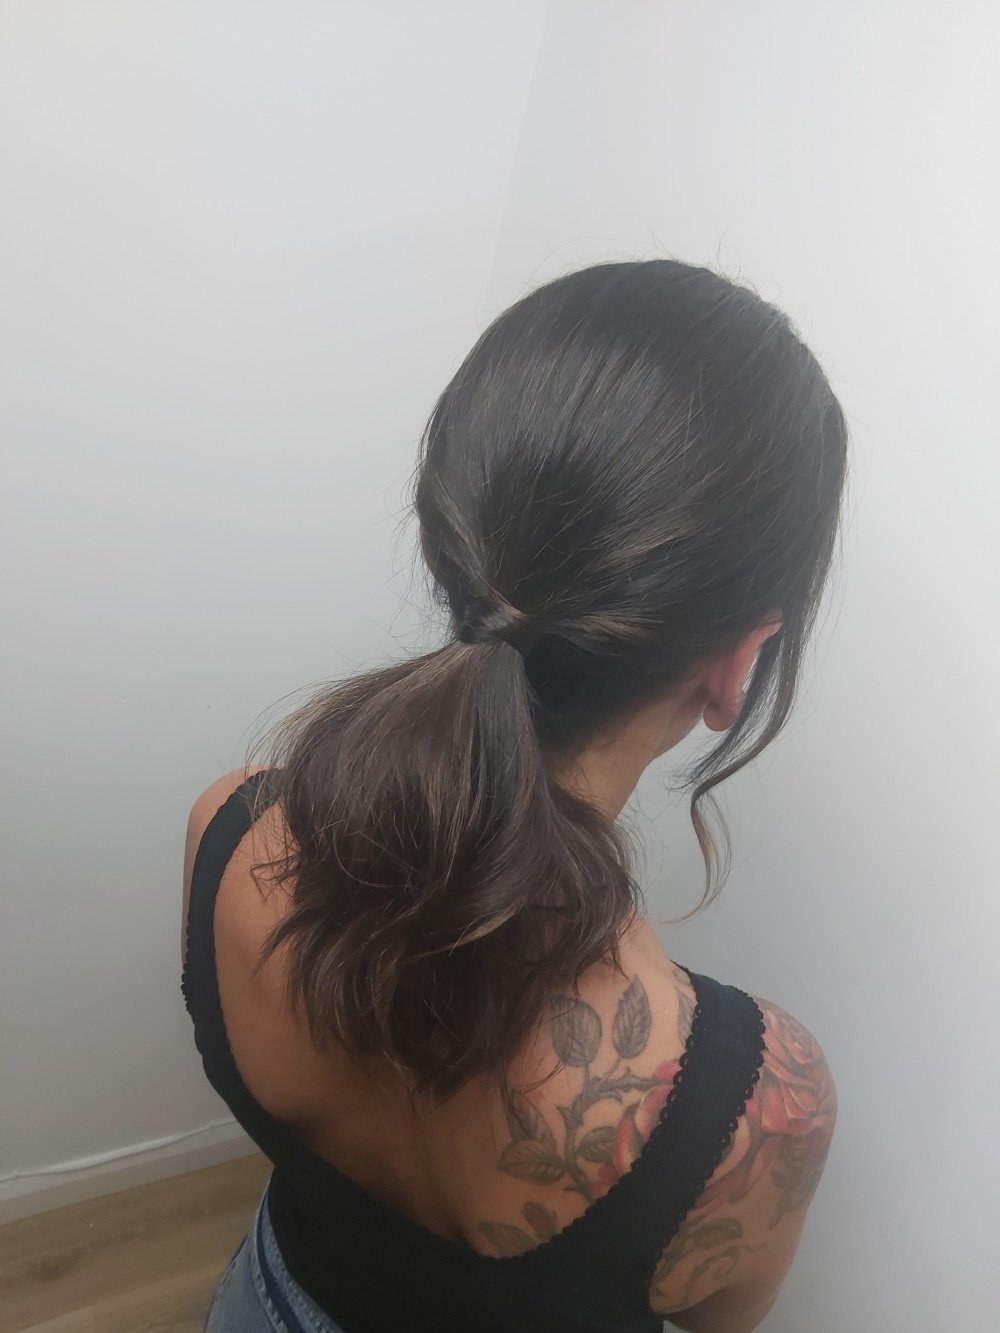 Smooth ponytail with a high shine. - Make Me Bridal Artist: Glow-Occasion Hair Specialists. #glamorous #glam #ponytail #texturedupdo #effortlesshair #shiney